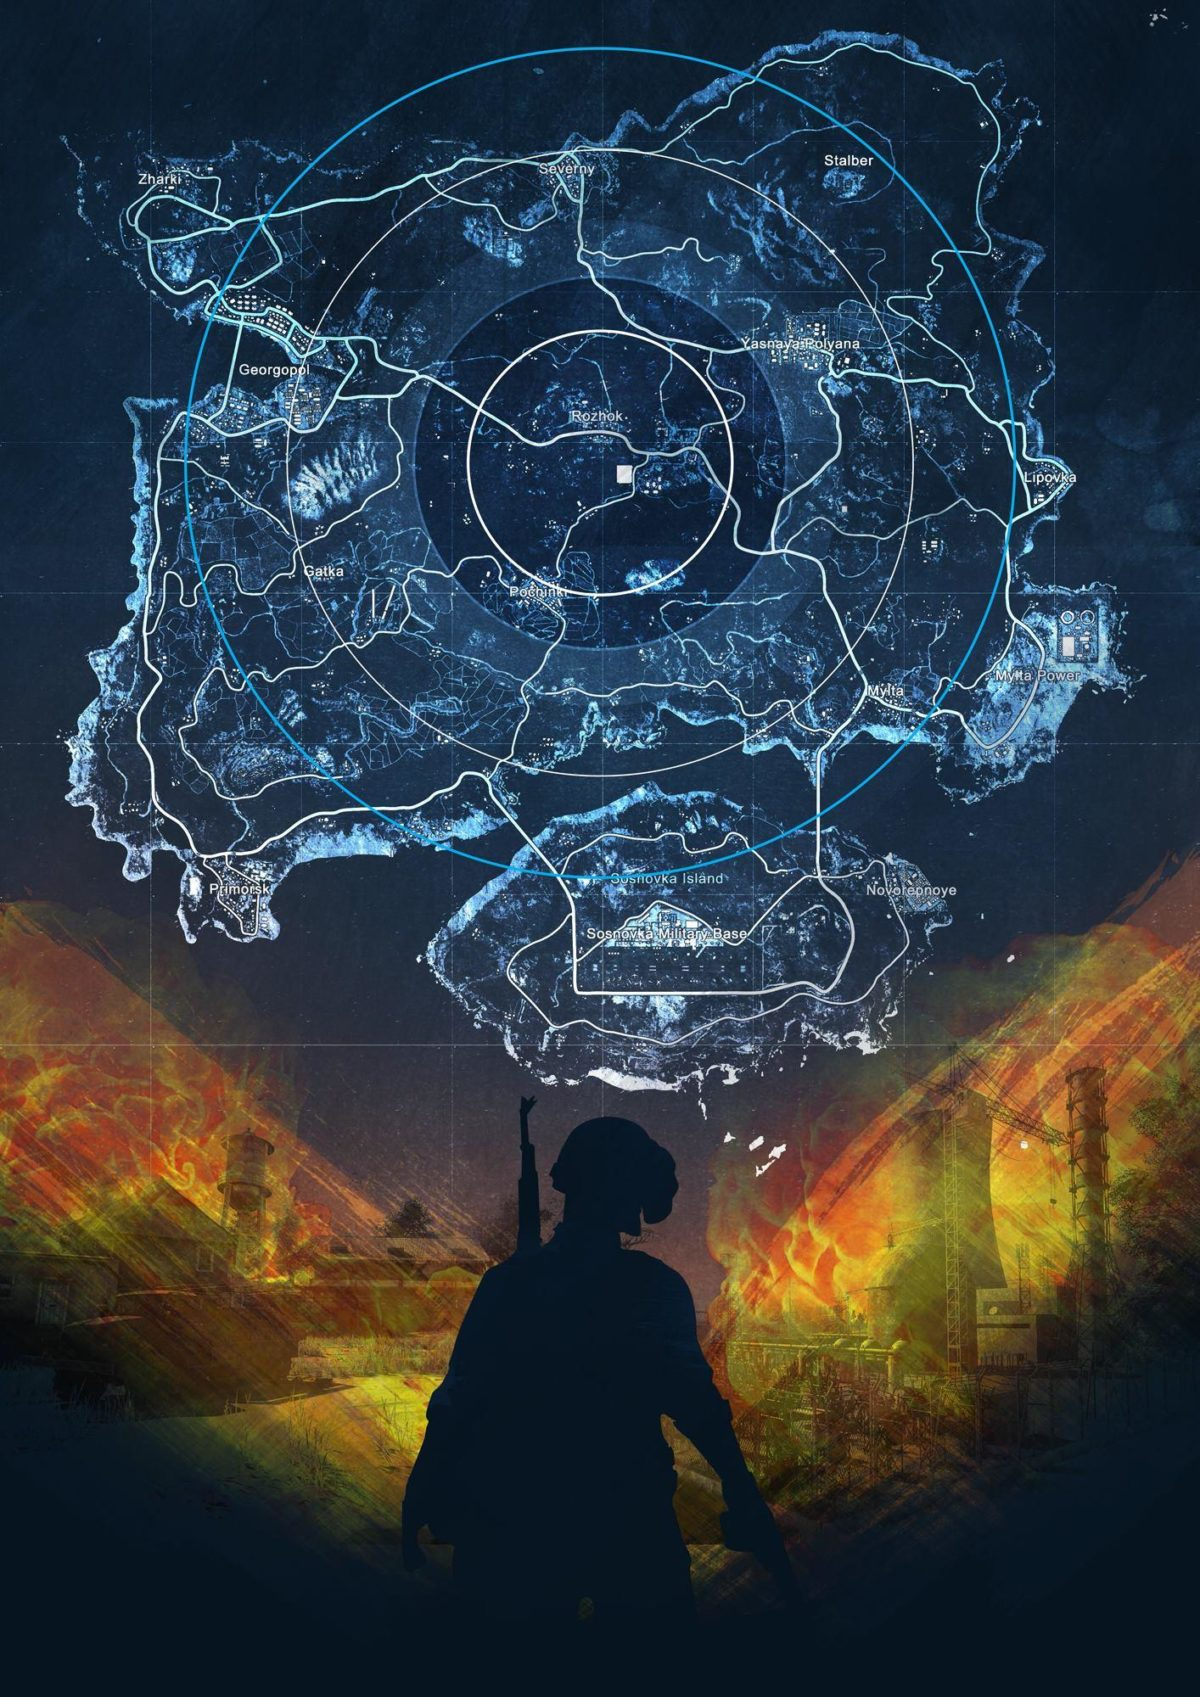 Battlegrounds map wallpaper for your phone – Album on Imgur